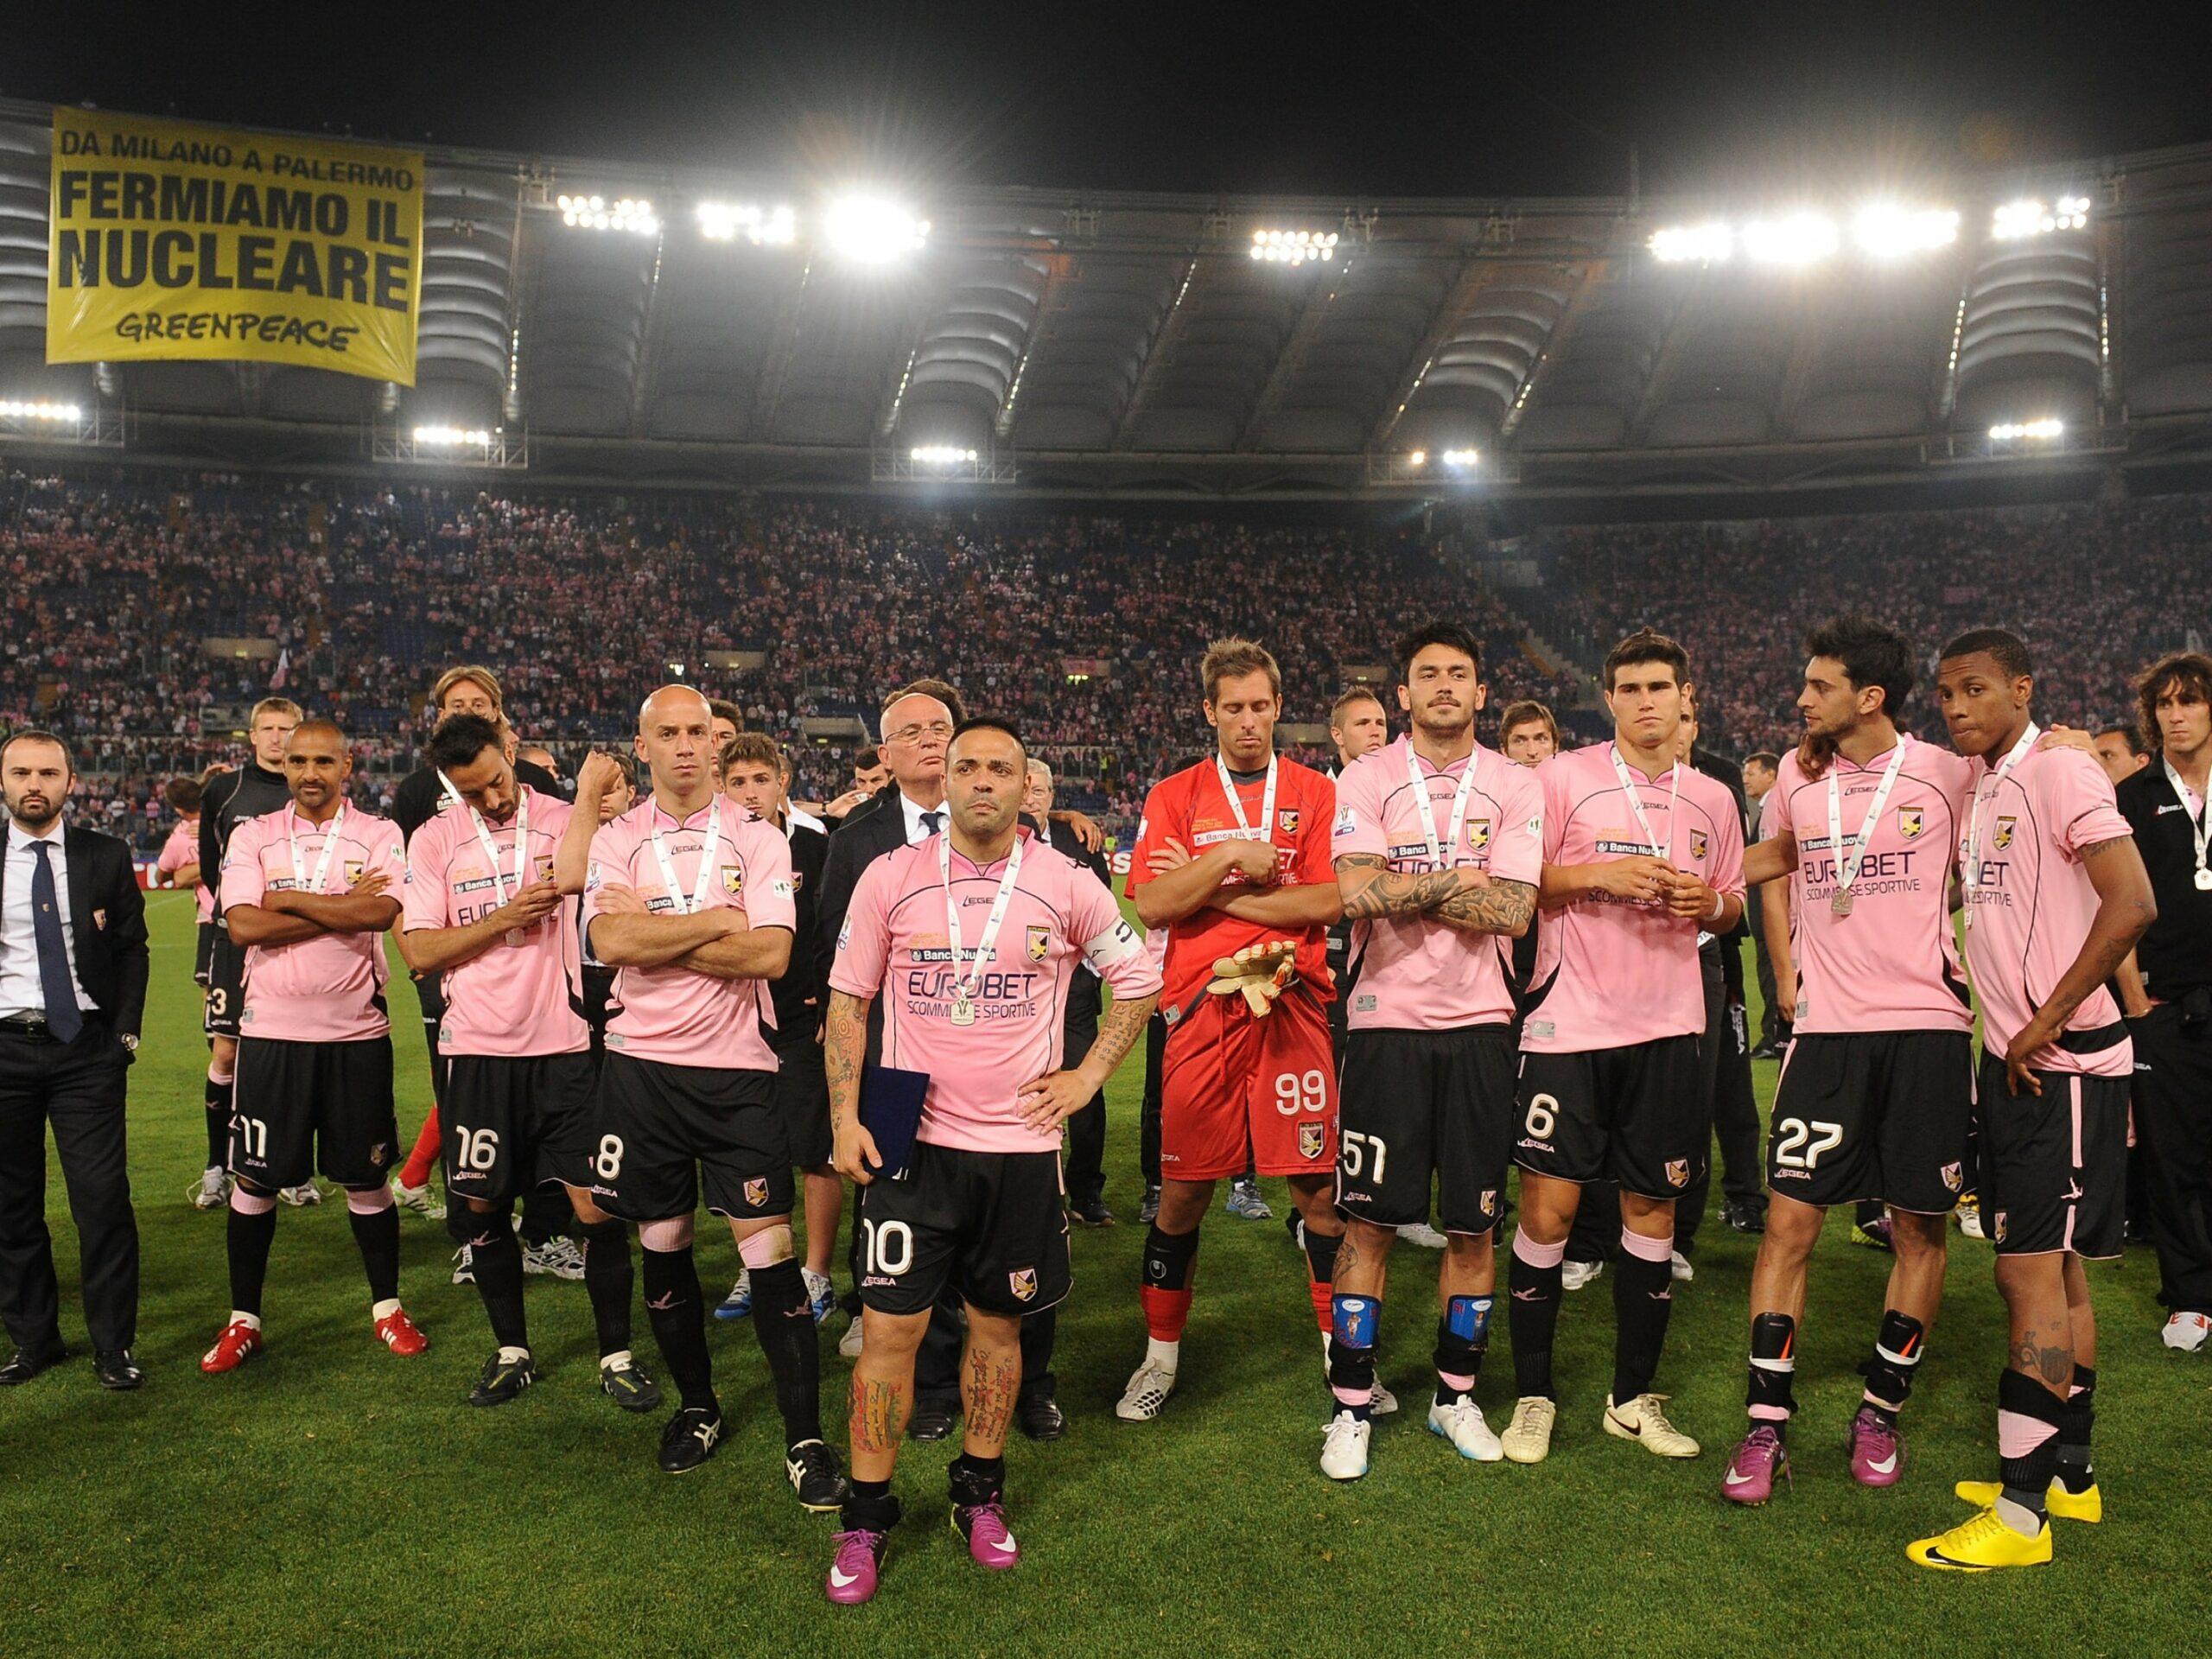 FC-Internazionale-Milano-v-US-Citta-di-Palermo-Tim-Cup-Final-1578934038.jpg